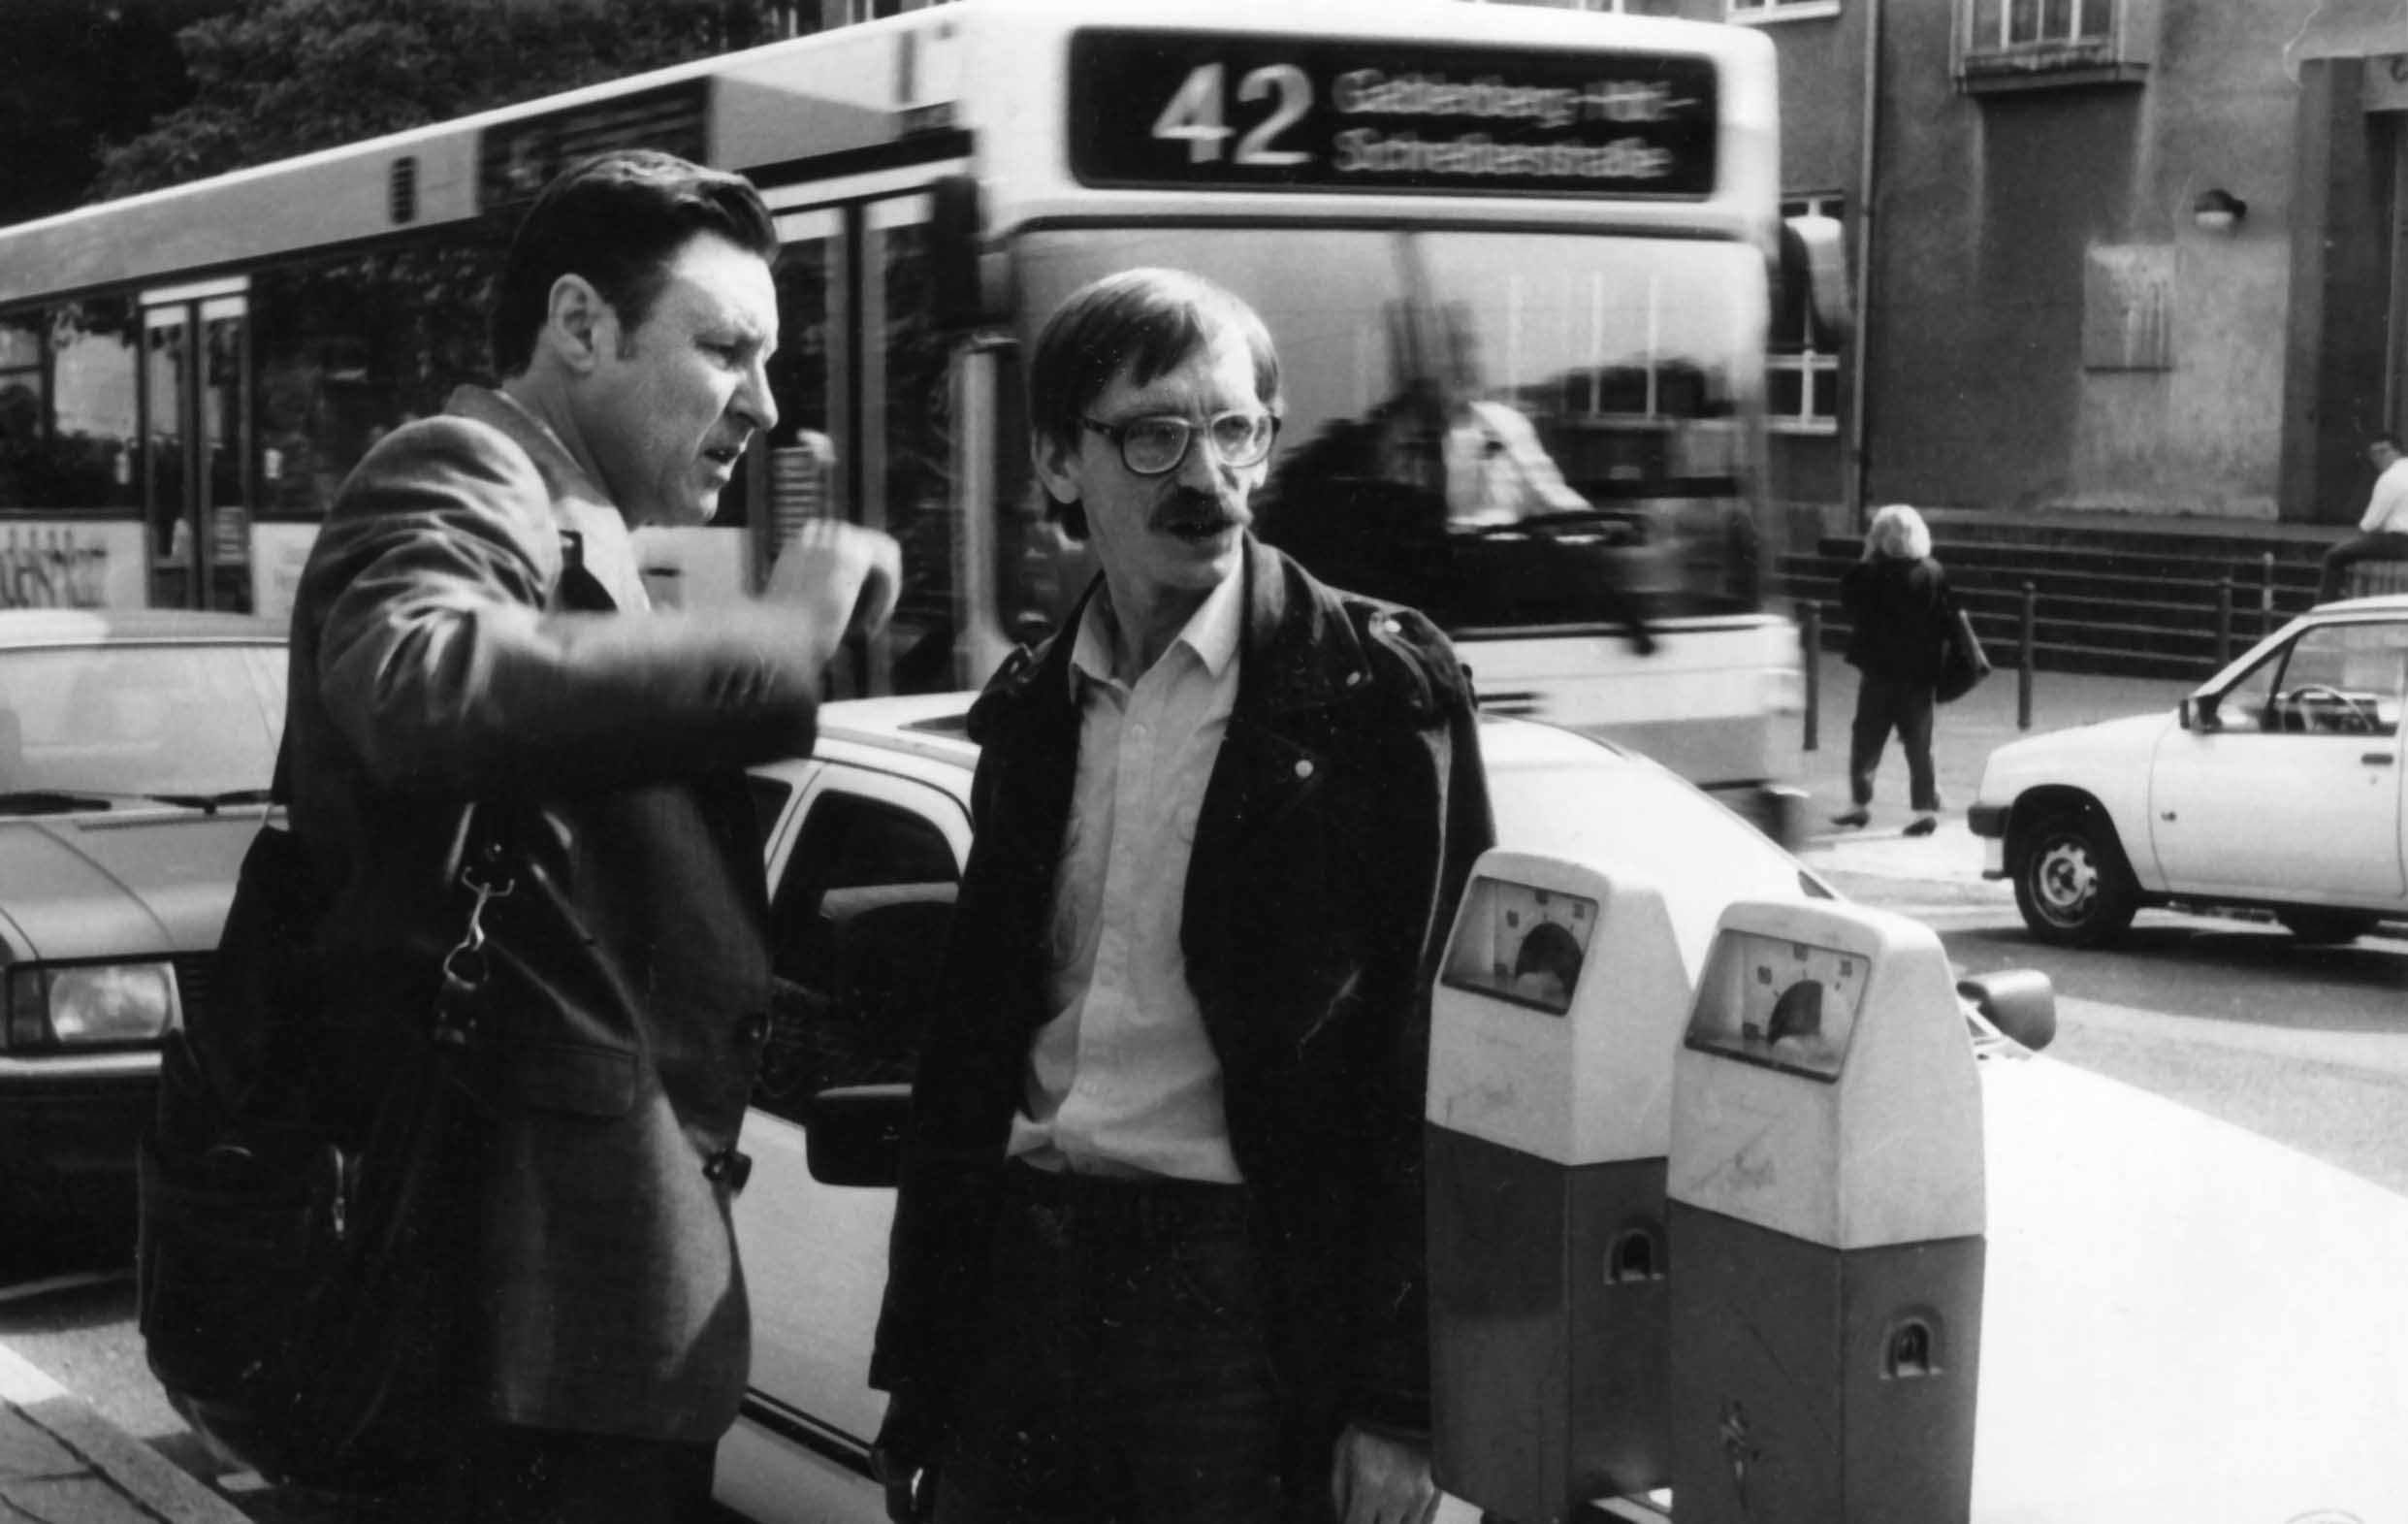 Экспонат #37. Германия. 1990 год